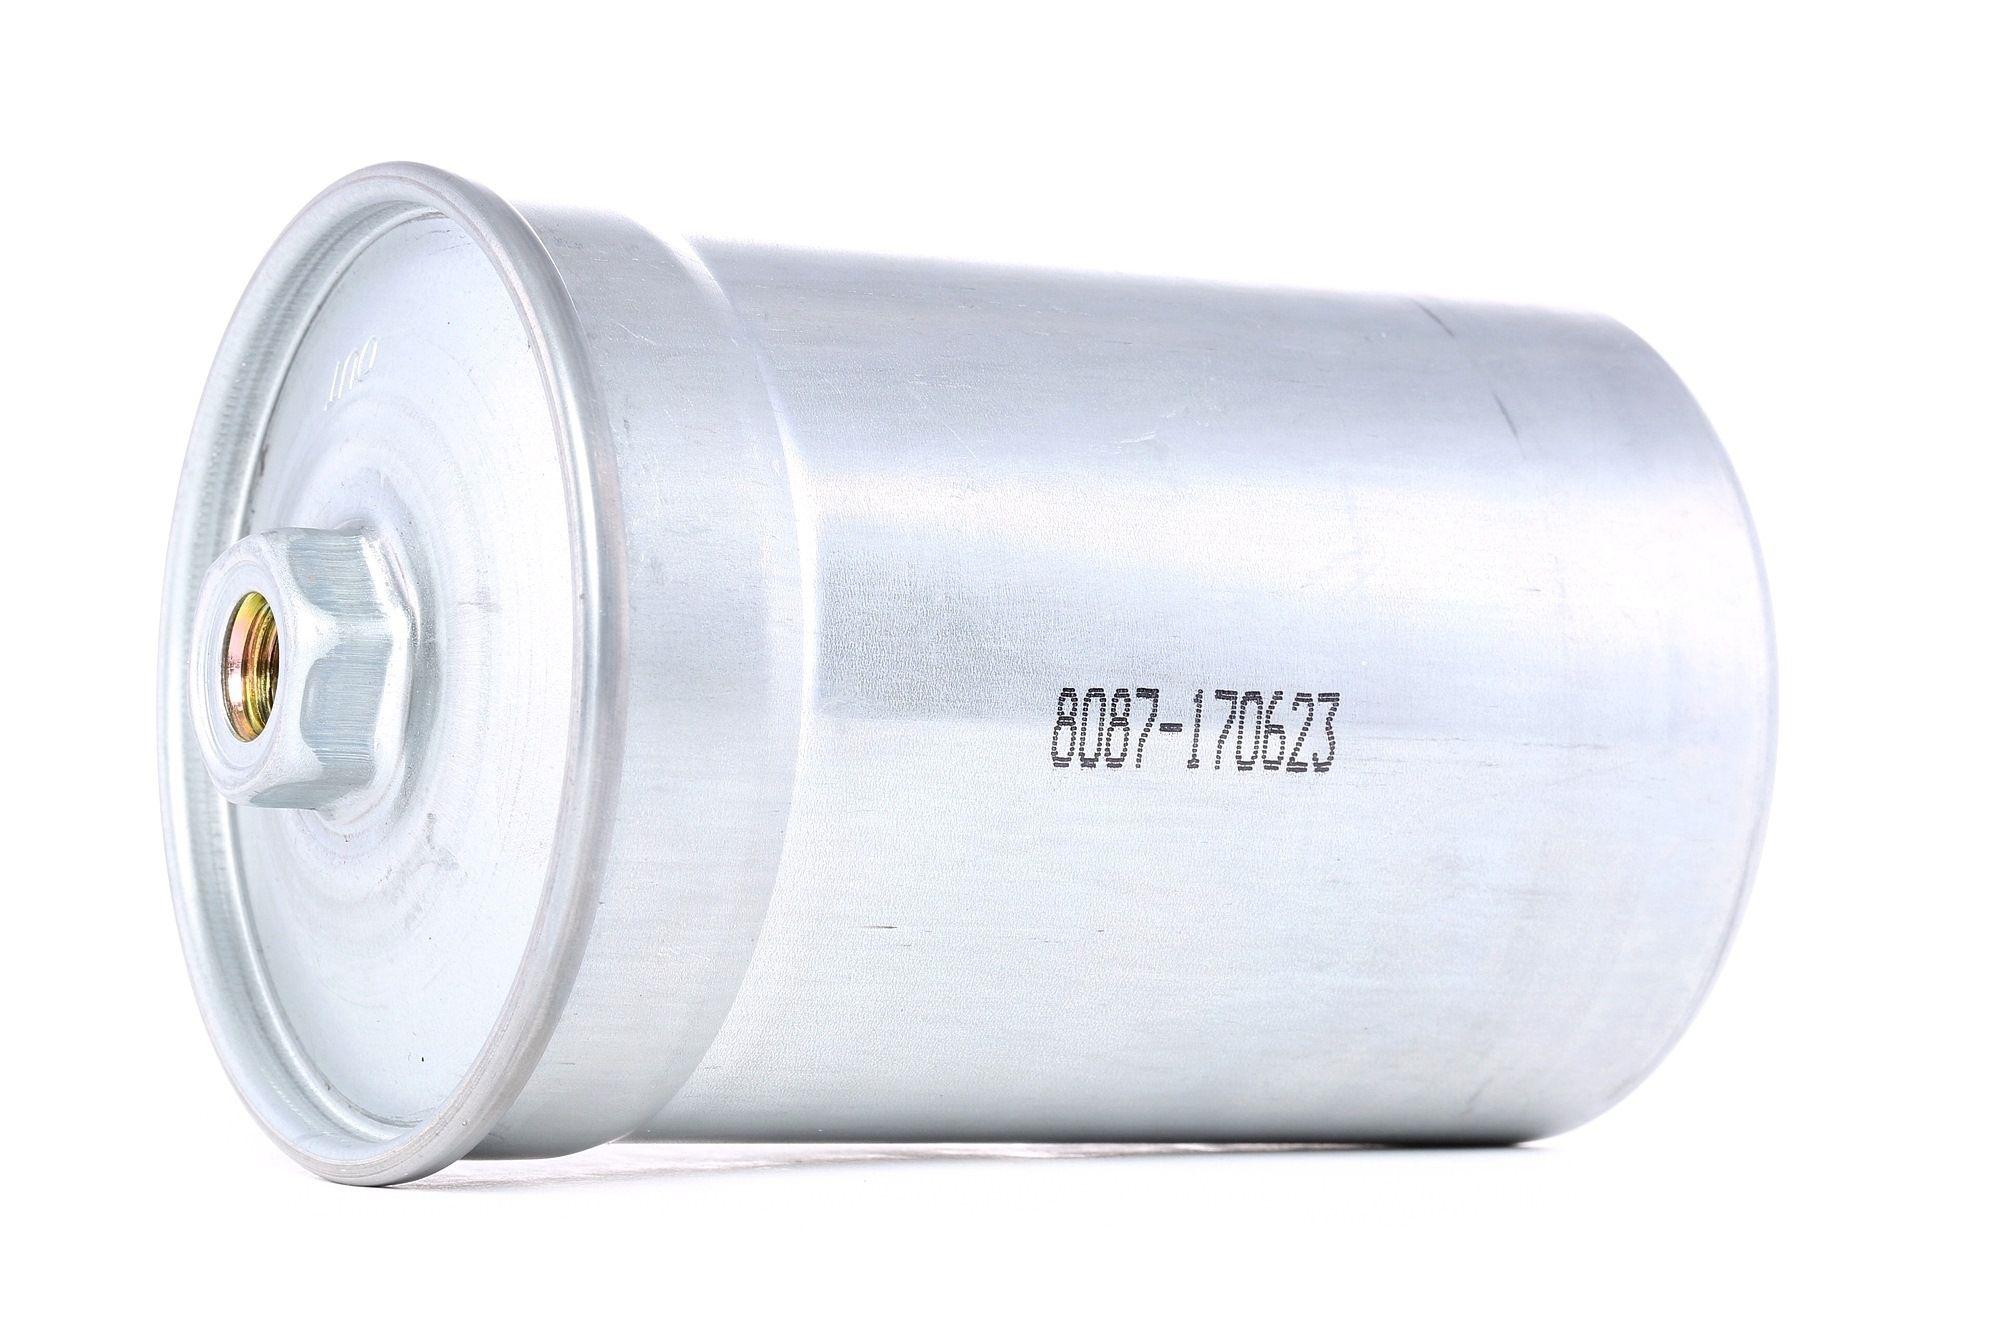 Brandstoffilter 9F0035 PANTHER lage prijzen - Koop Nu!